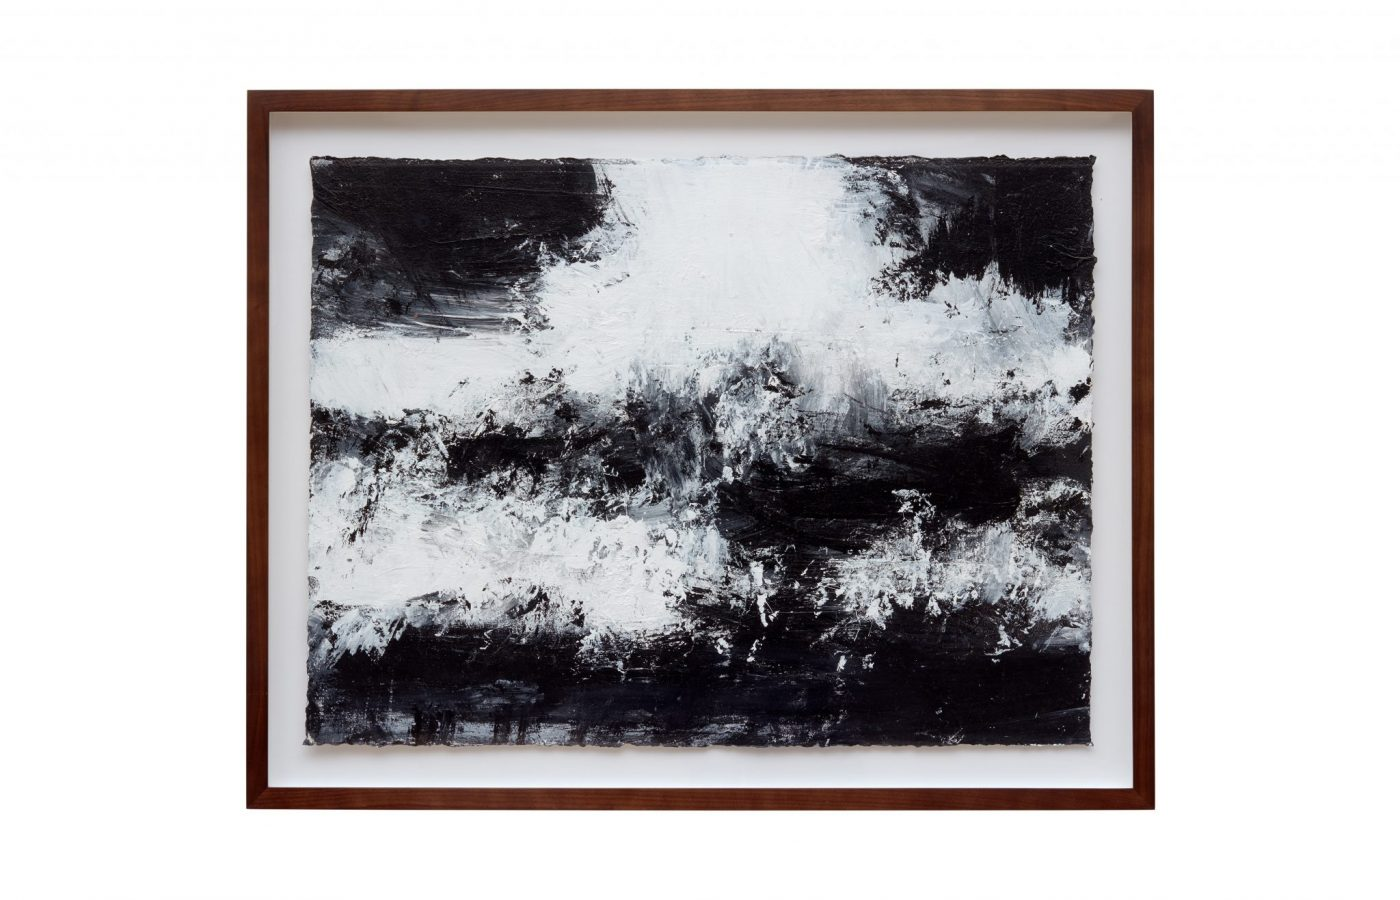 FXF18-29 John Virtue Untitled NO 32 2014